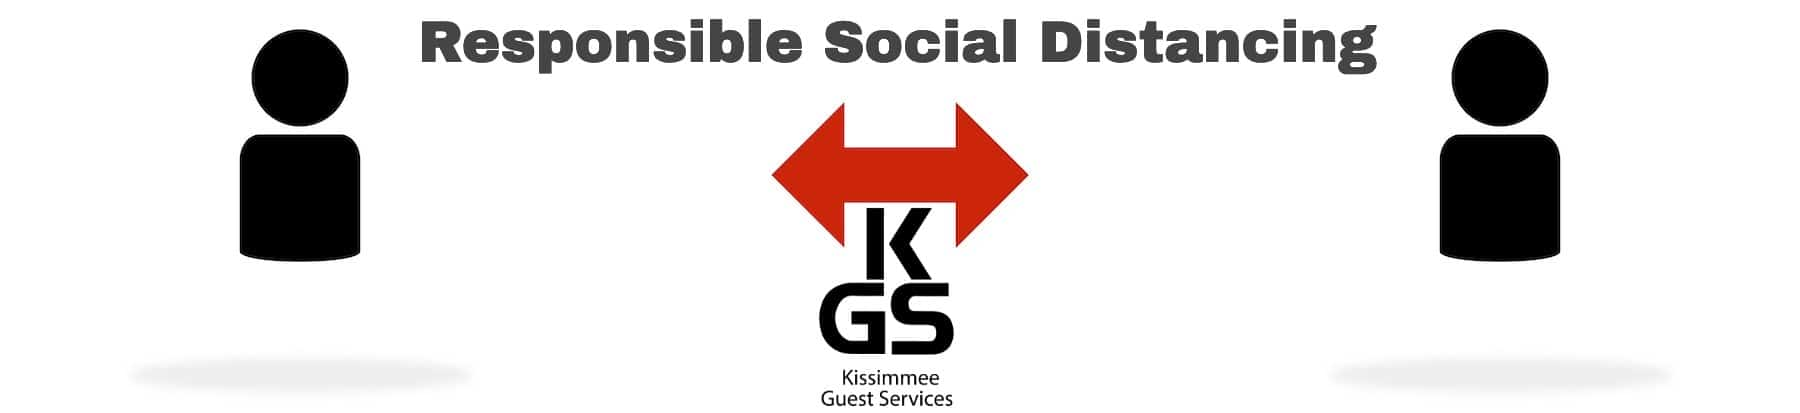 KGS Responsible Social Distancing